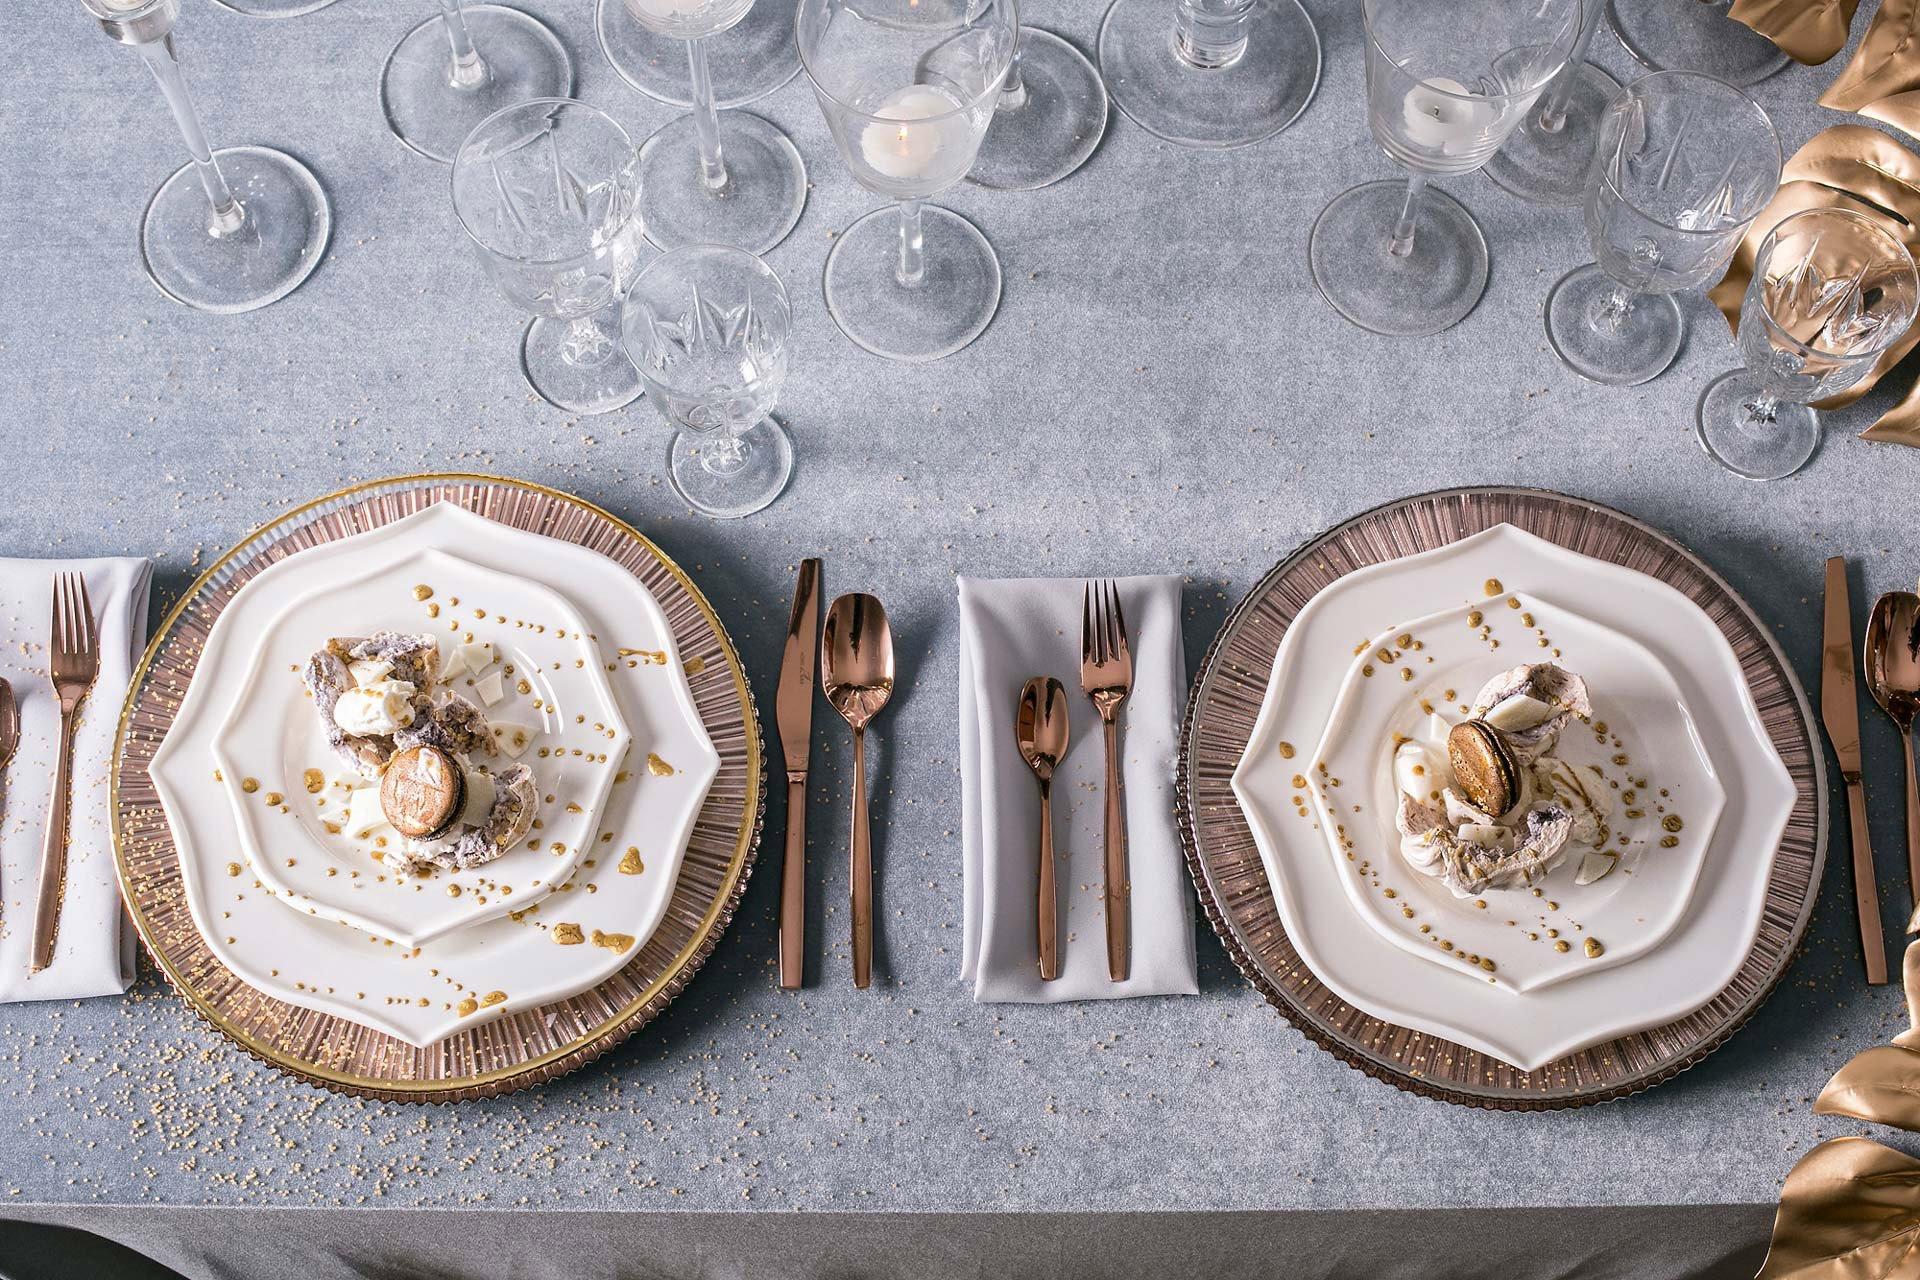 Сервировка стола с итальянским мотивом